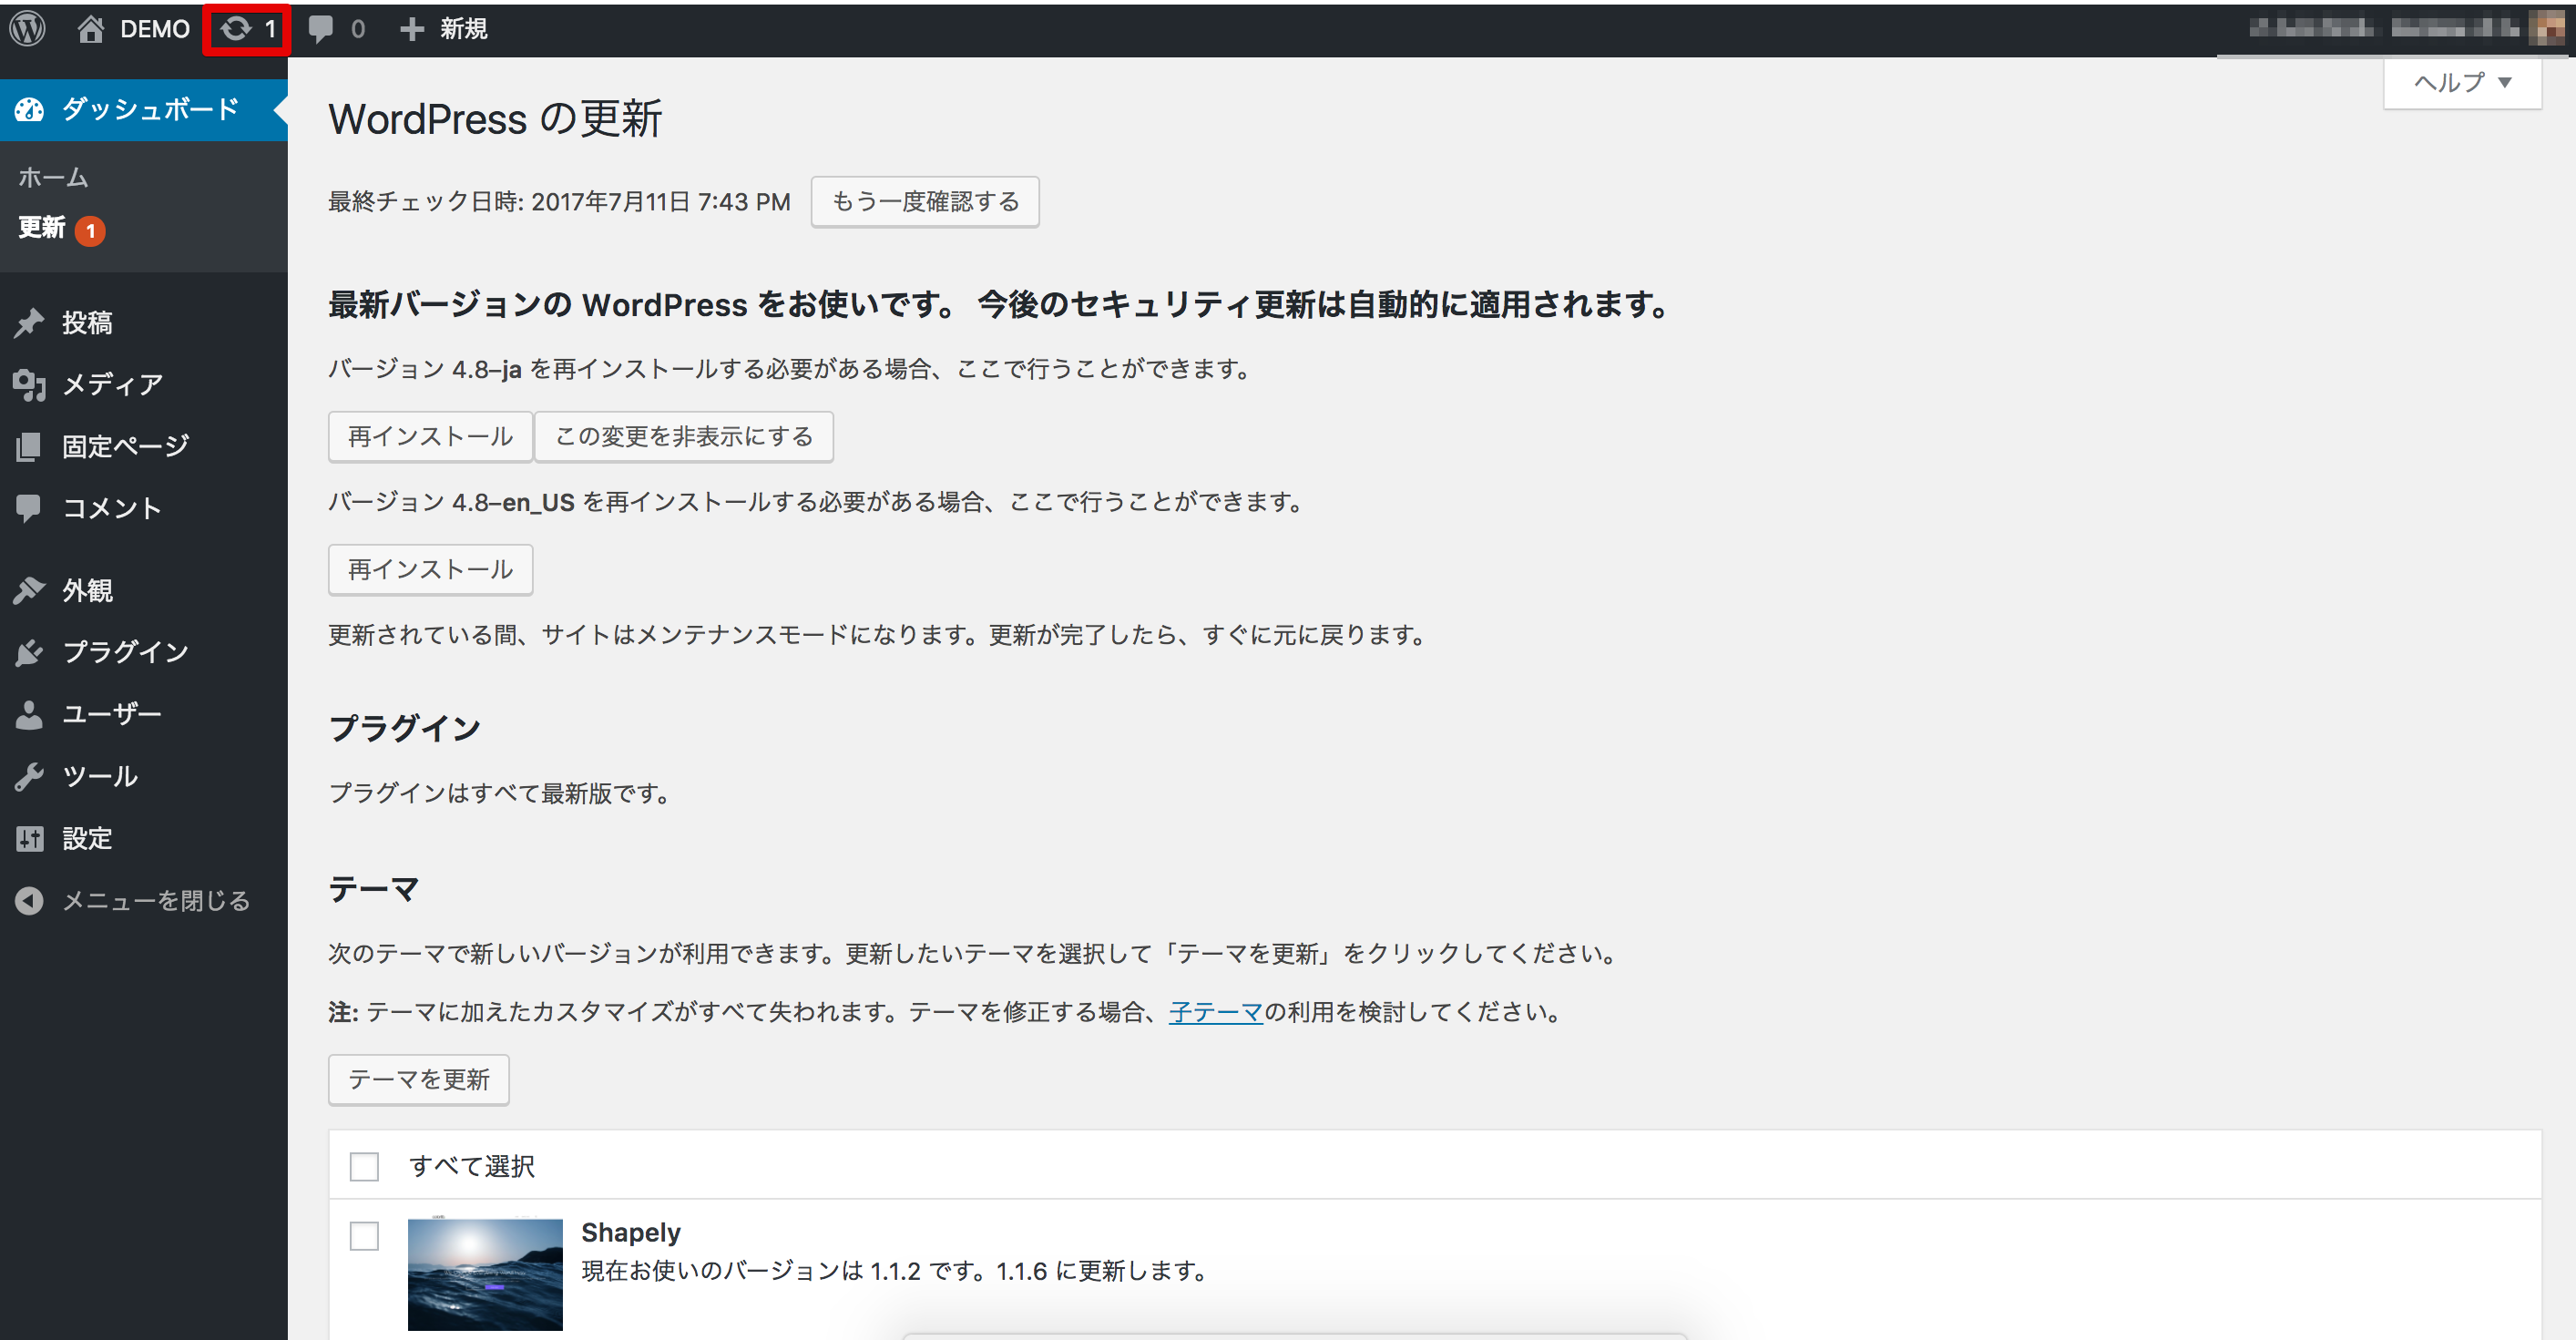 wordpress1 - WordPressの脆弱性対策!事前にできるセキュリティ対策まとめ